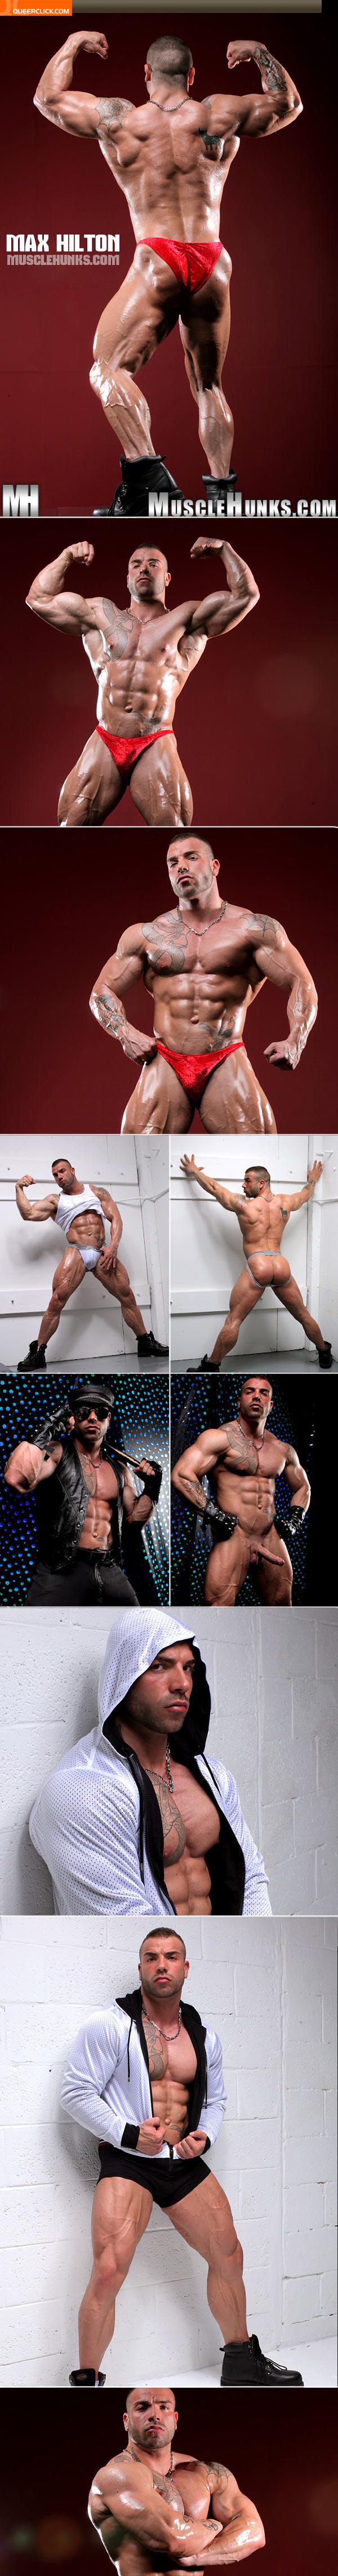 Muscle hunk max hilton phrase